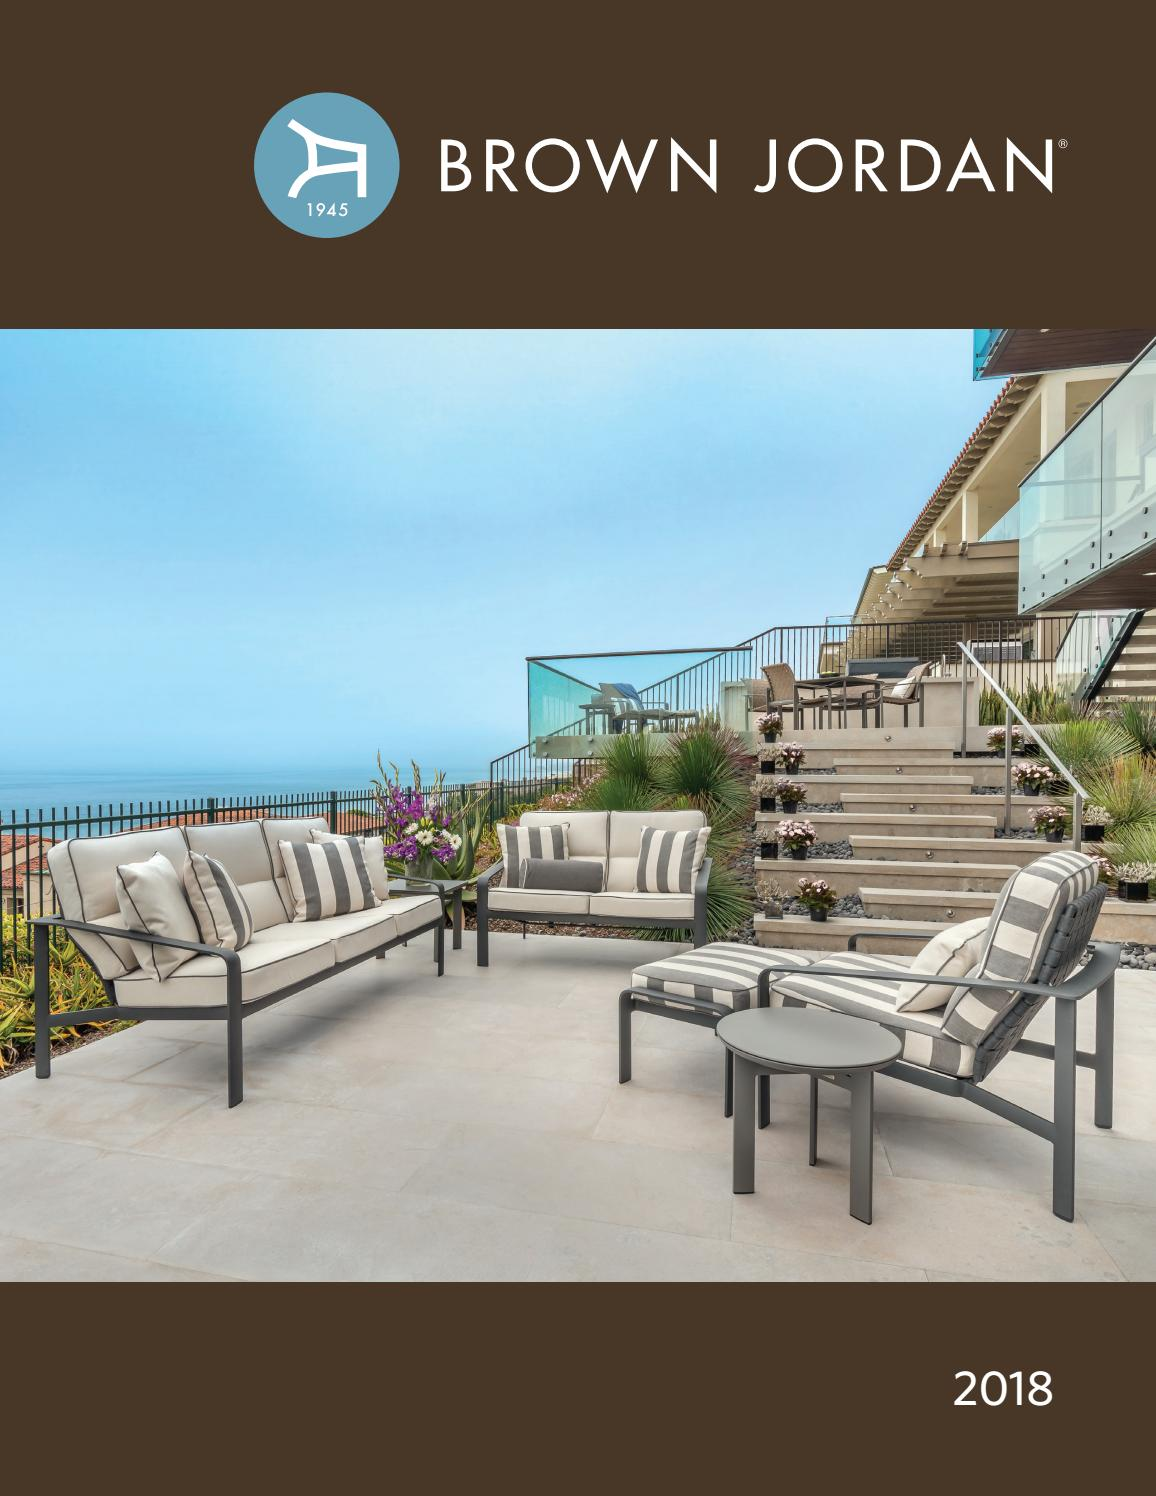 Wondrous Brown Jordan Catalog 2018 By Brown Jordan Issuu Forskolin Free Trial Chair Design Images Forskolin Free Trialorg